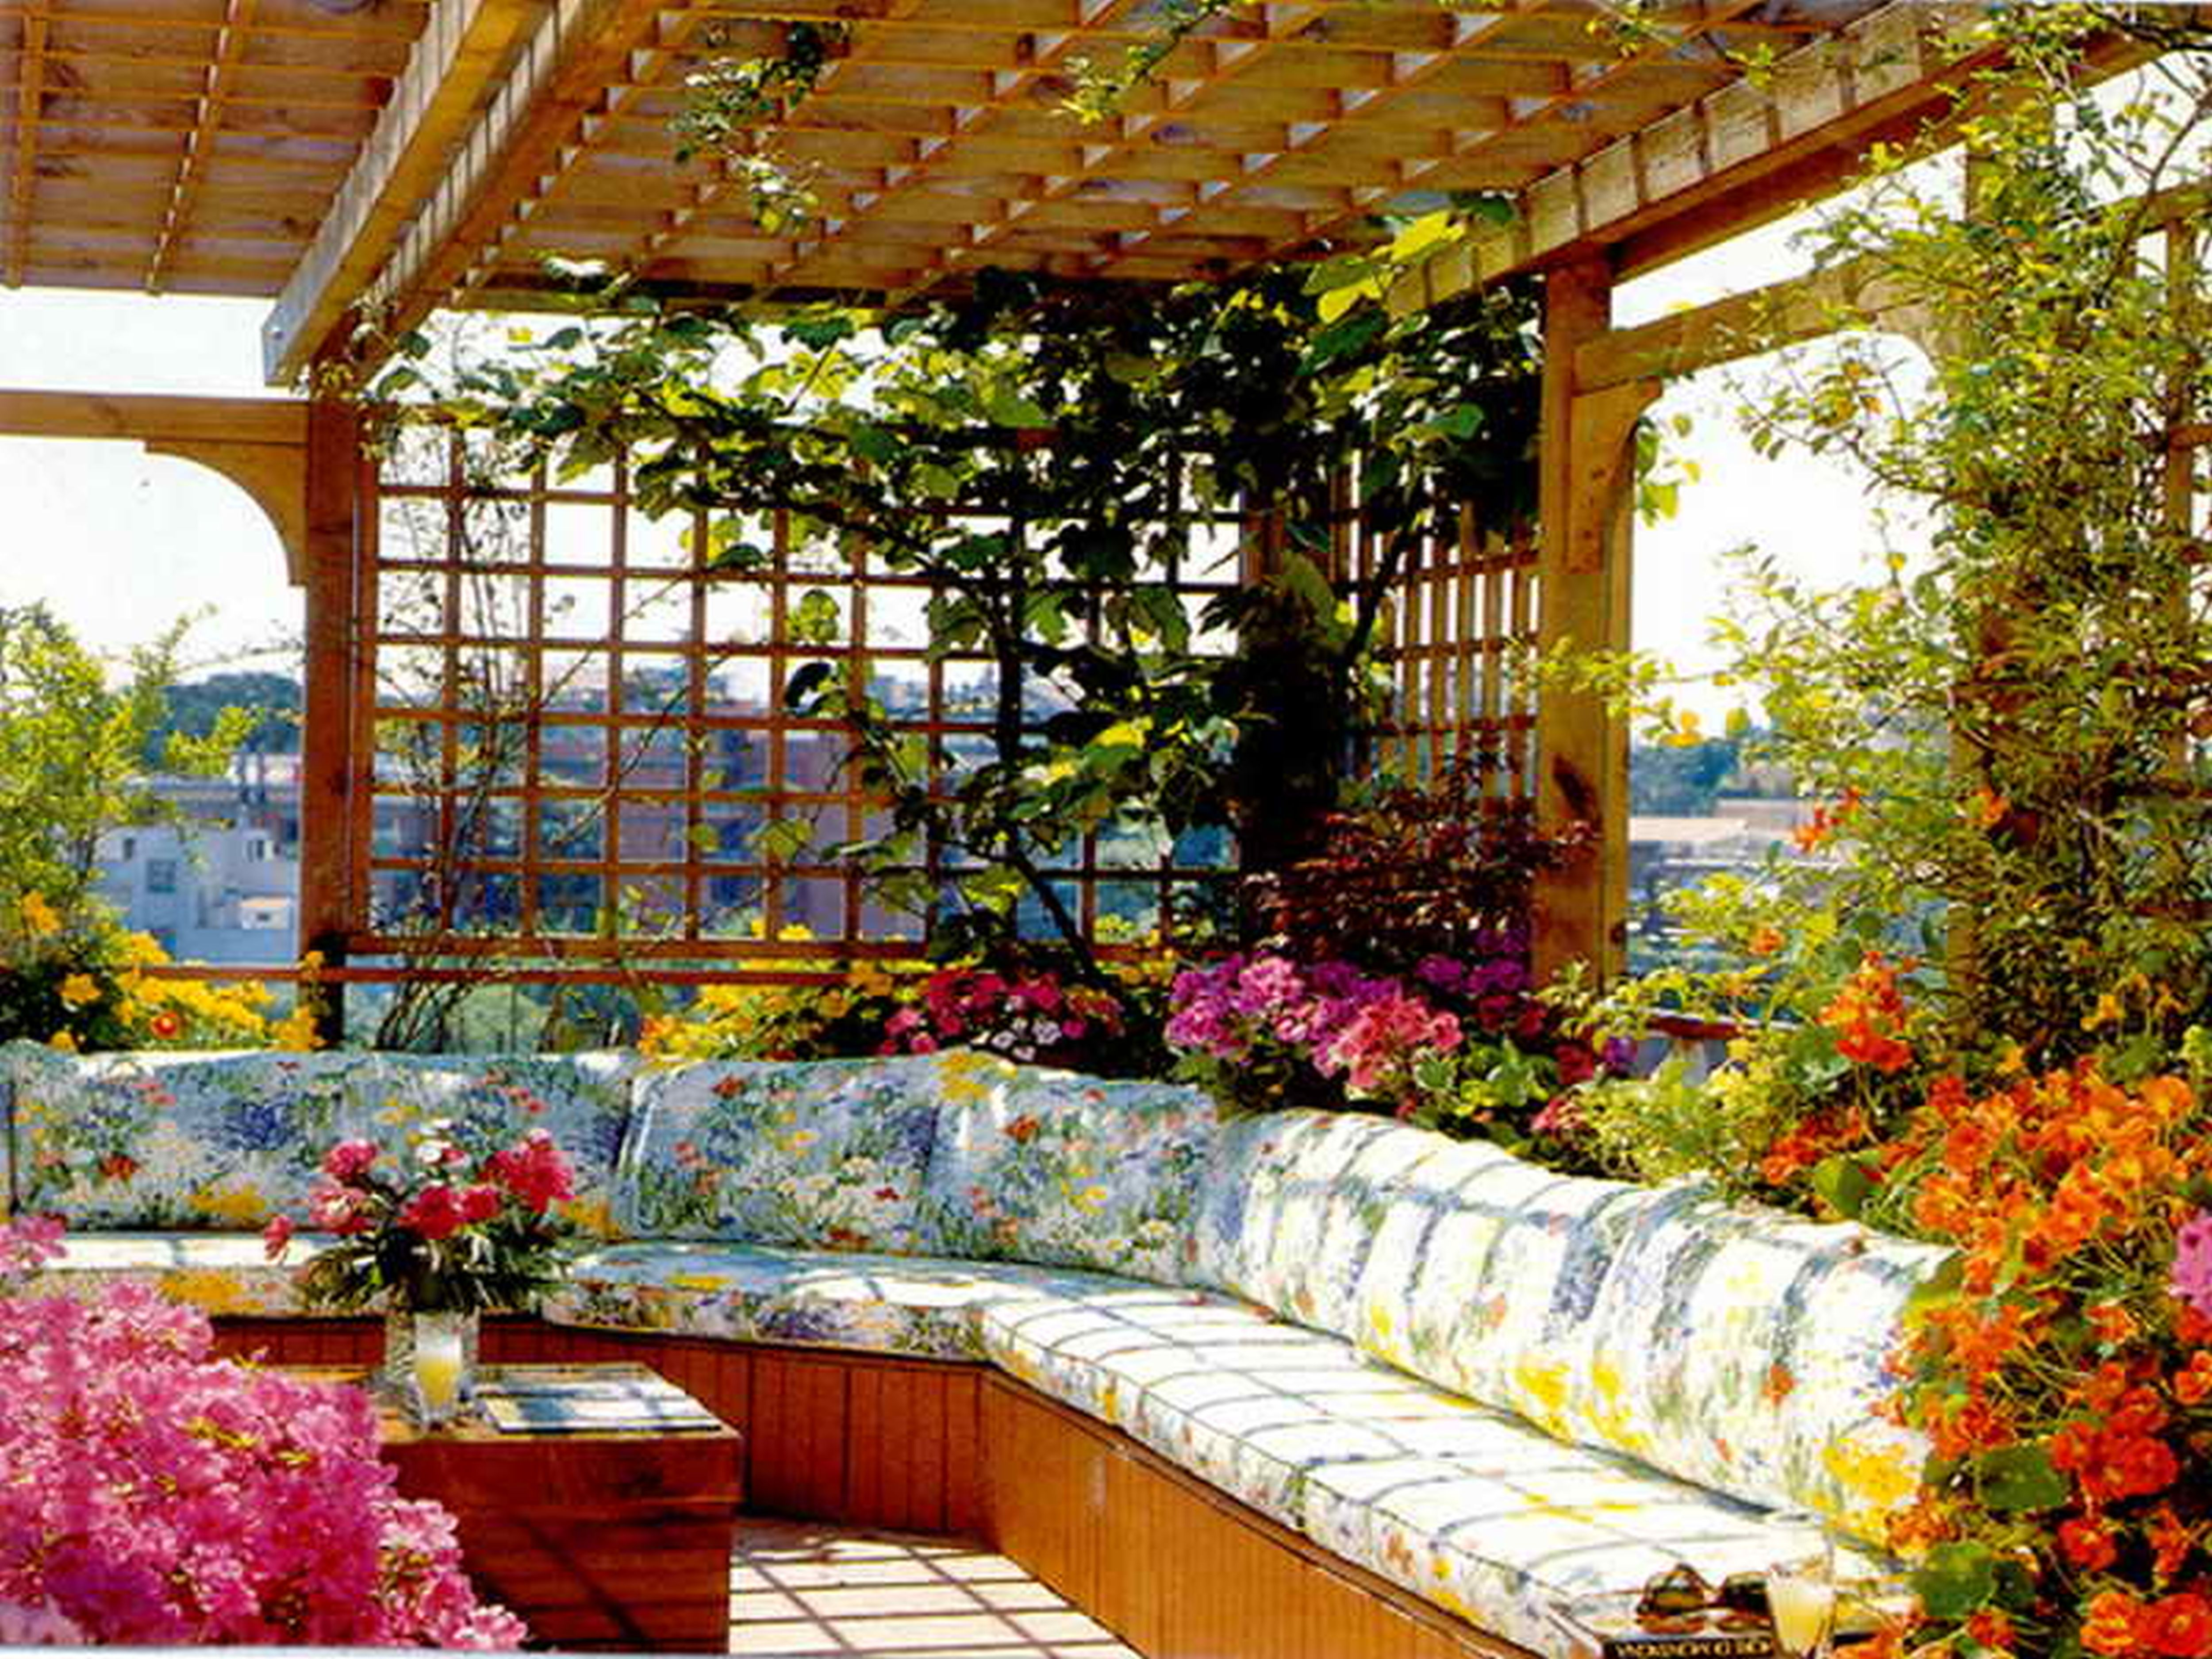 Rooftop Garden Design garden ideas design together Rooftop Flower Garden Design Ideas Mediterranean Style 1836